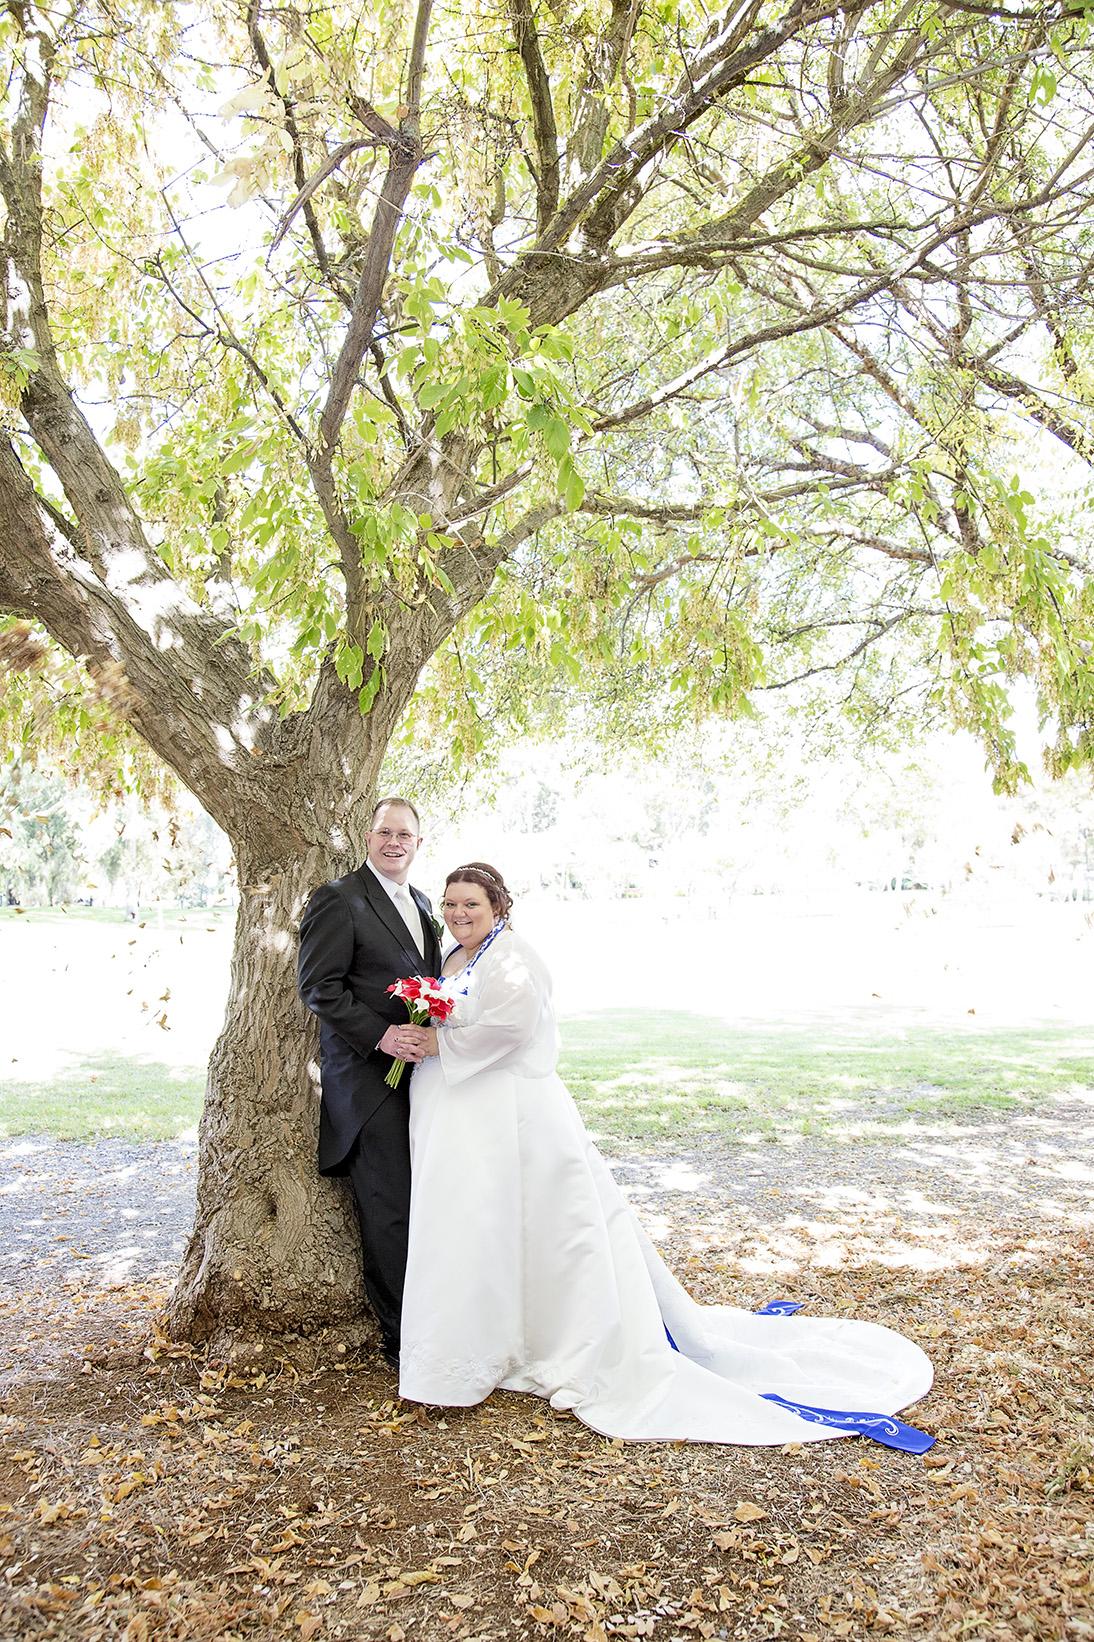 Sferas Modbury wedding 16.jpg